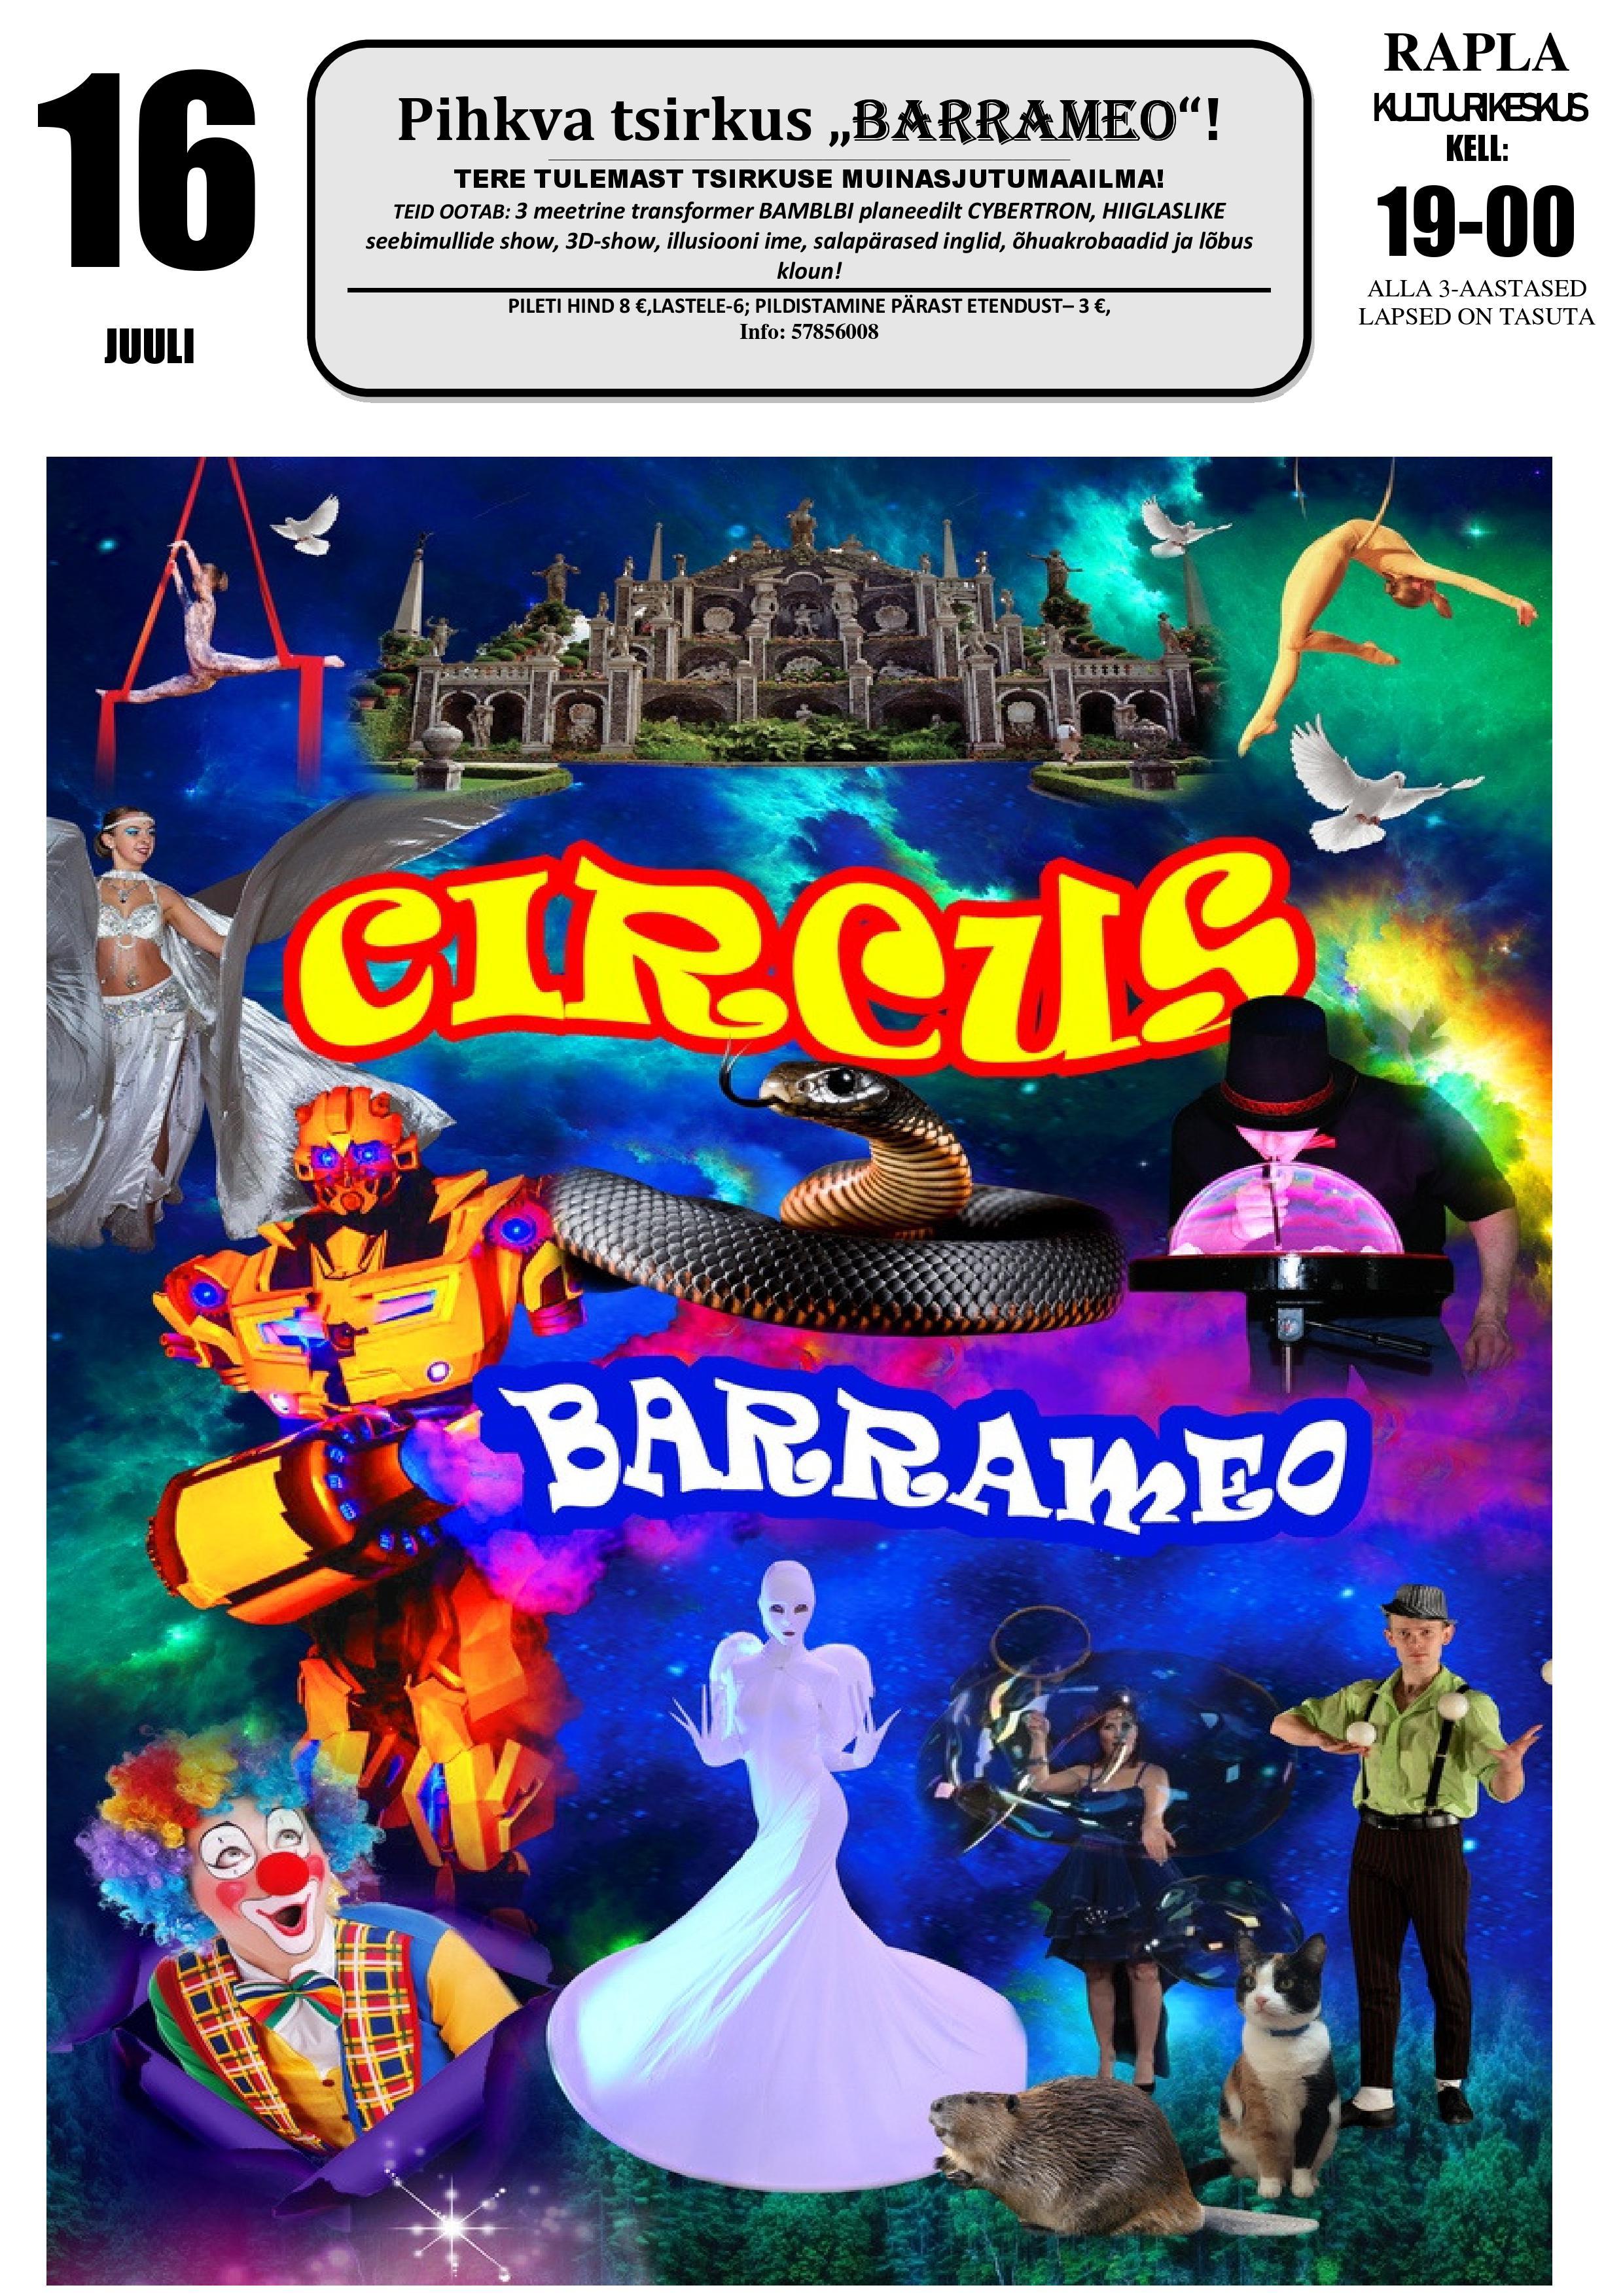 "Pihkva tsirkus ""Barrameo"""